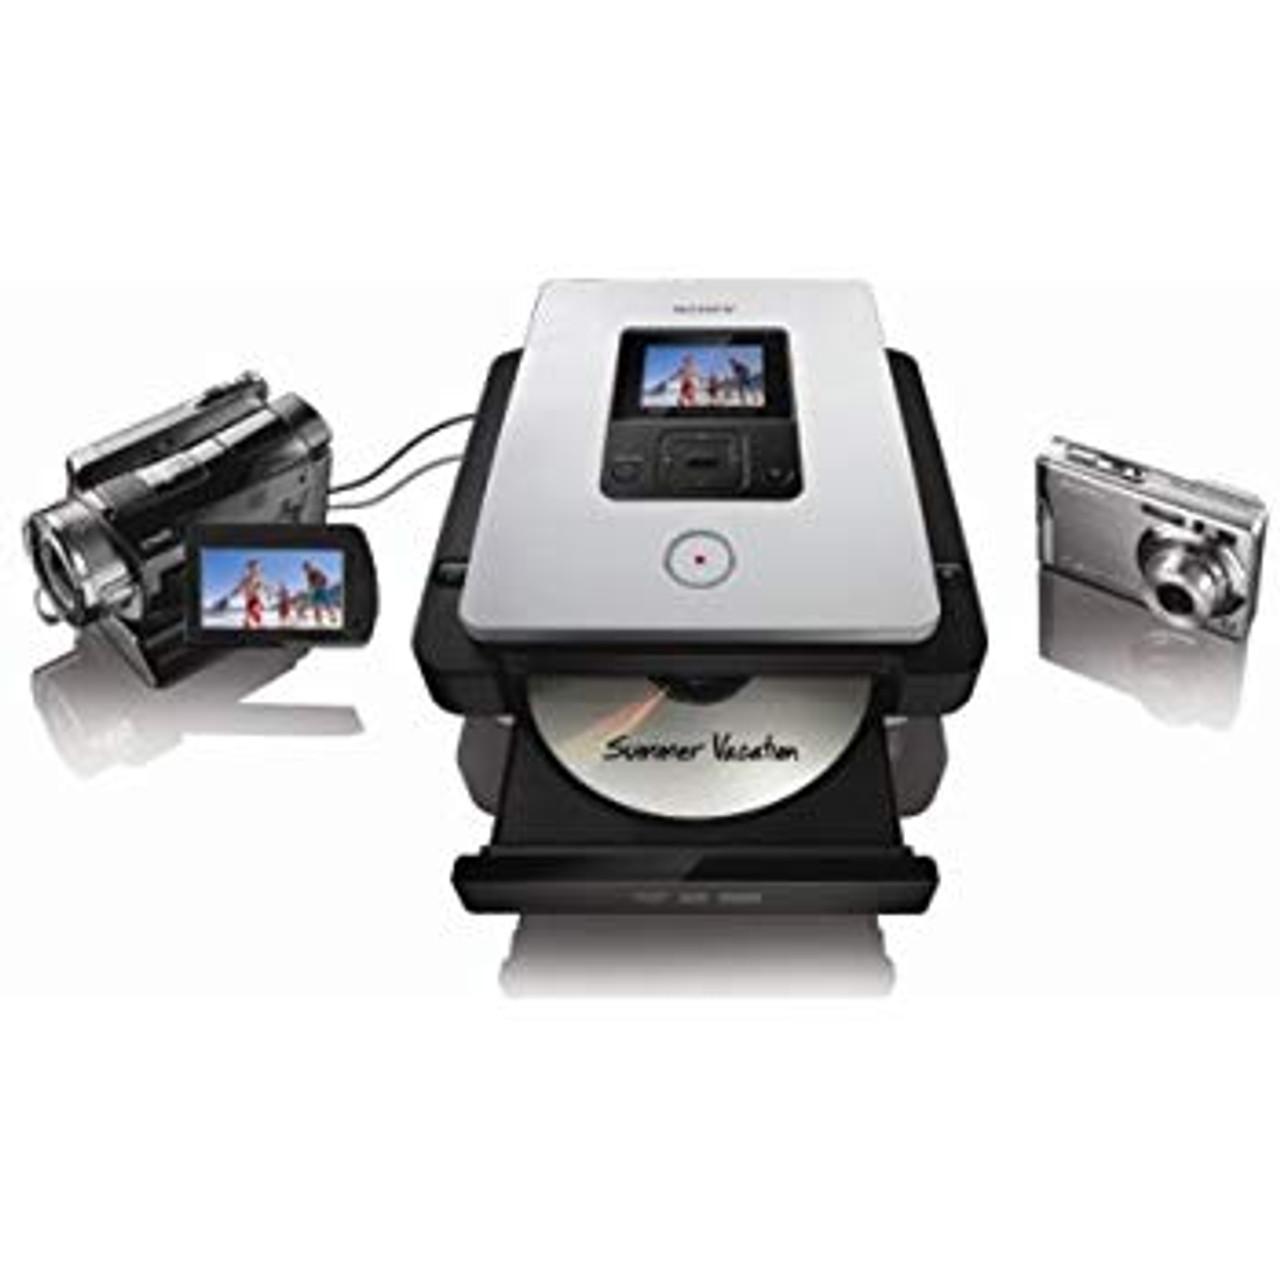 Sony VRD-MC5 DVD Recorder